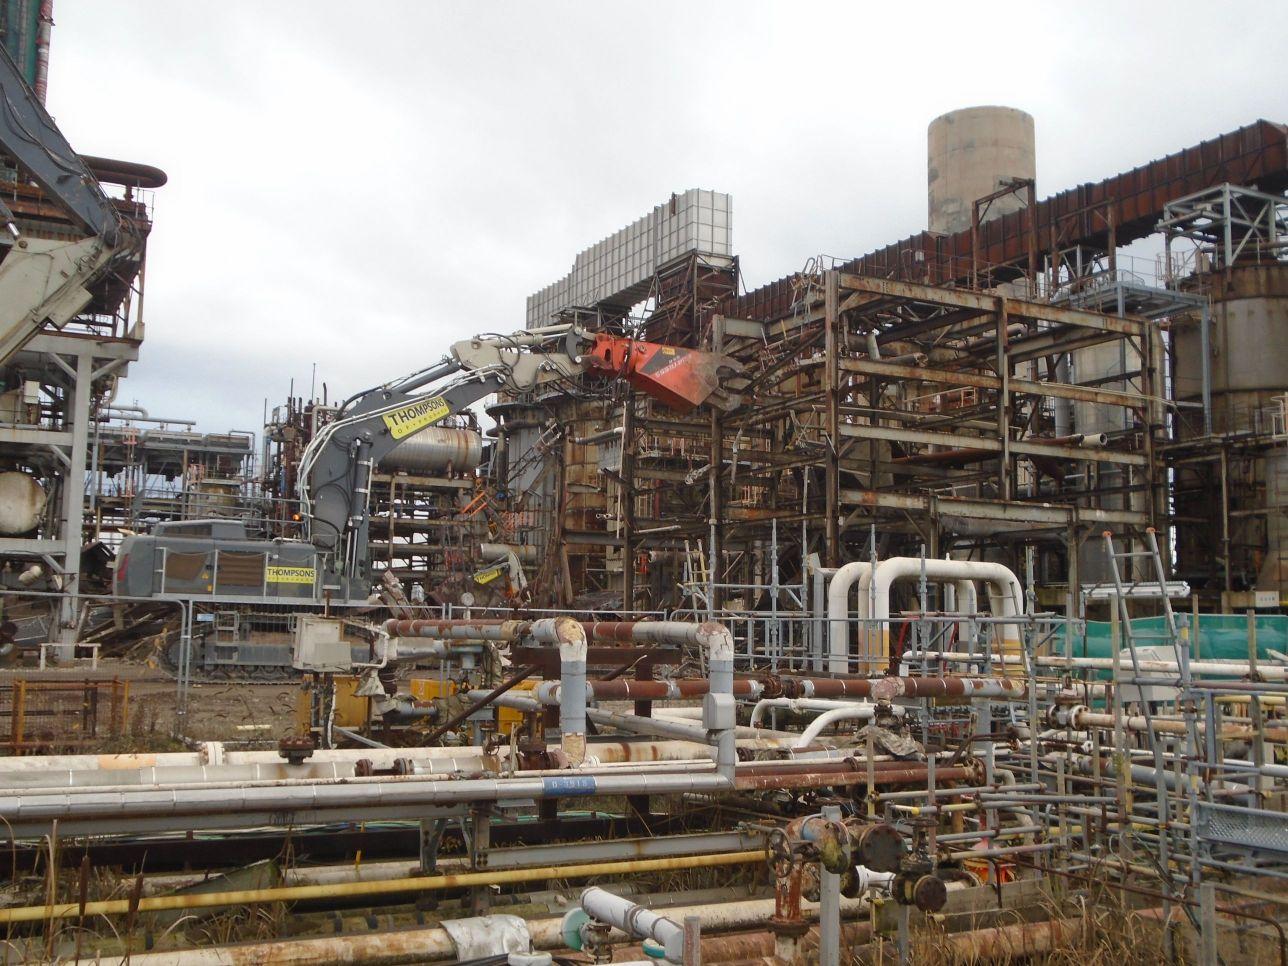 Industrial Factory Dismantling